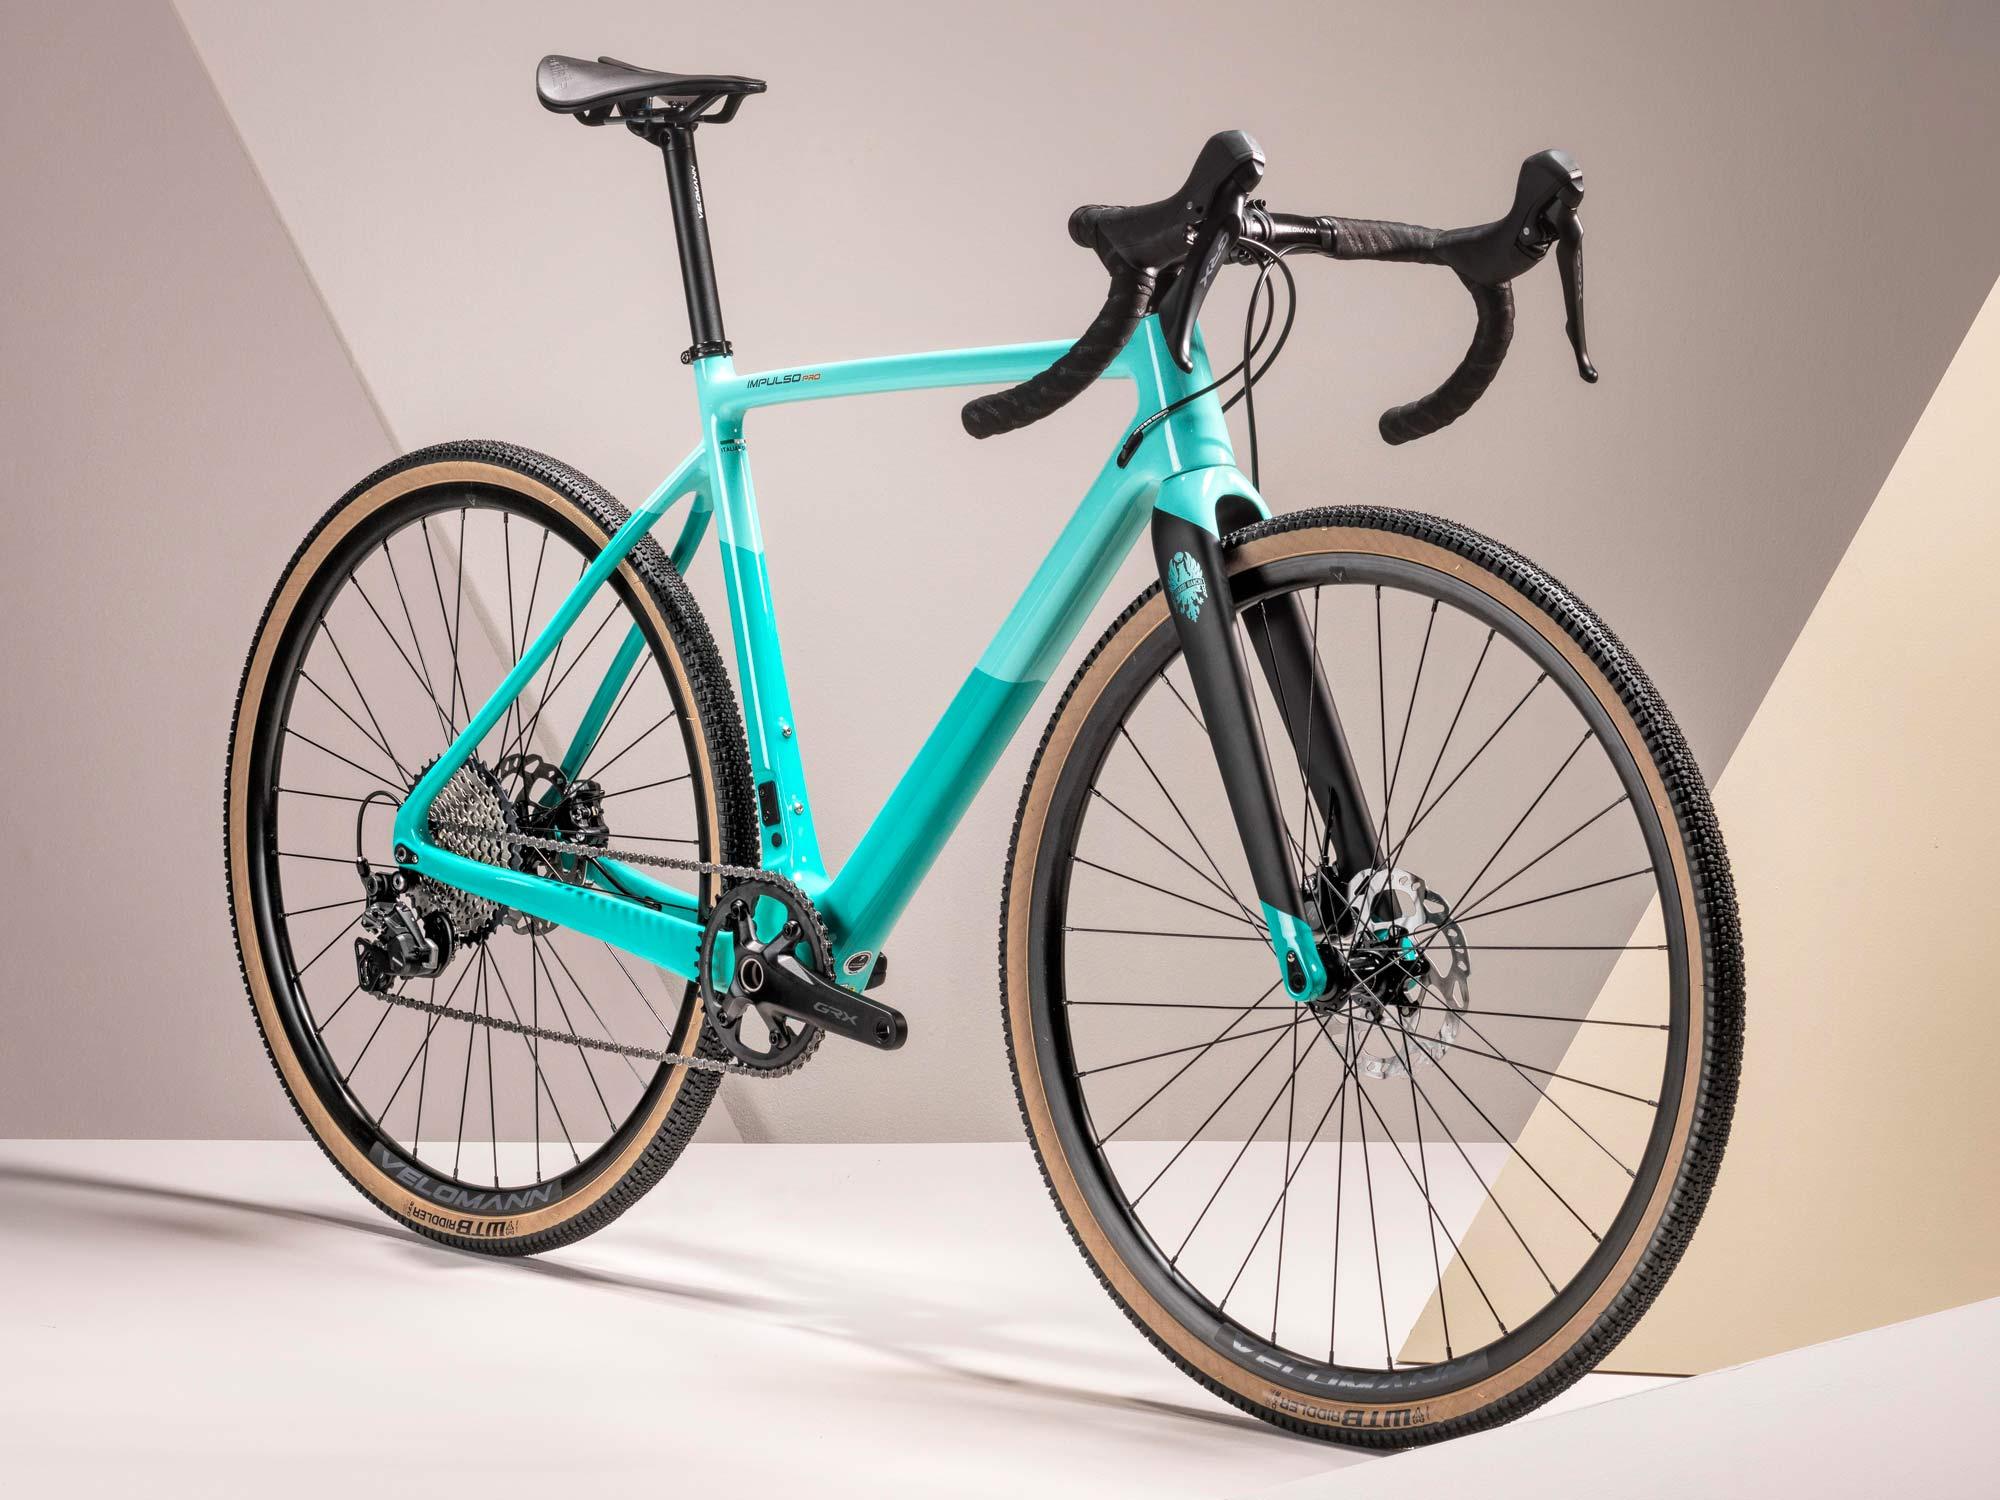 2022 Bianchi Impulso Pro carbon gravel bike, Zolder Pro CX cross cyclocross bike reborn,angled complete